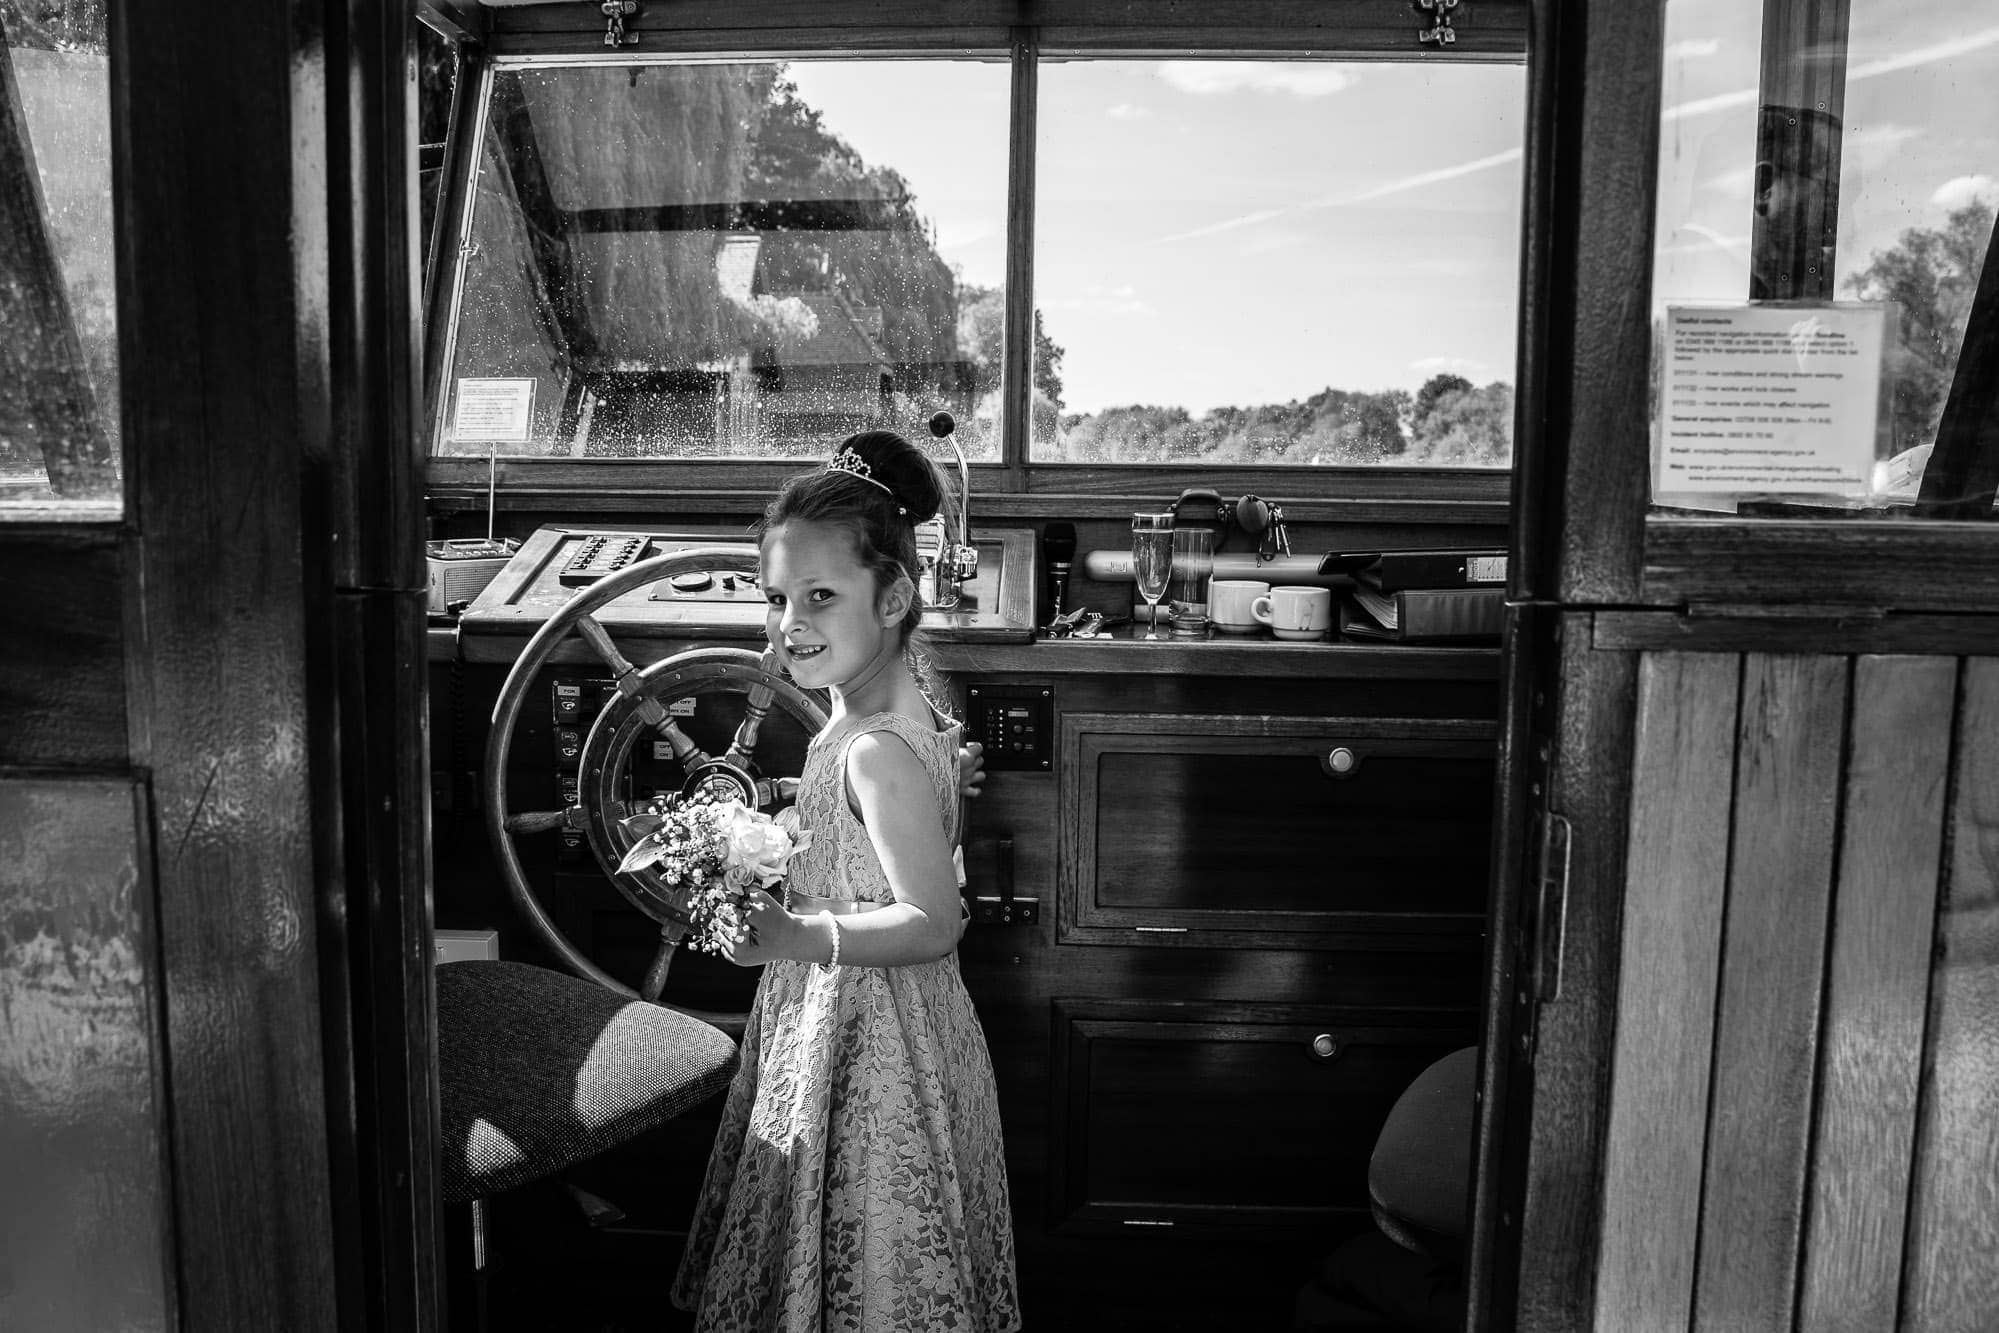 Flower Girl driving the boat